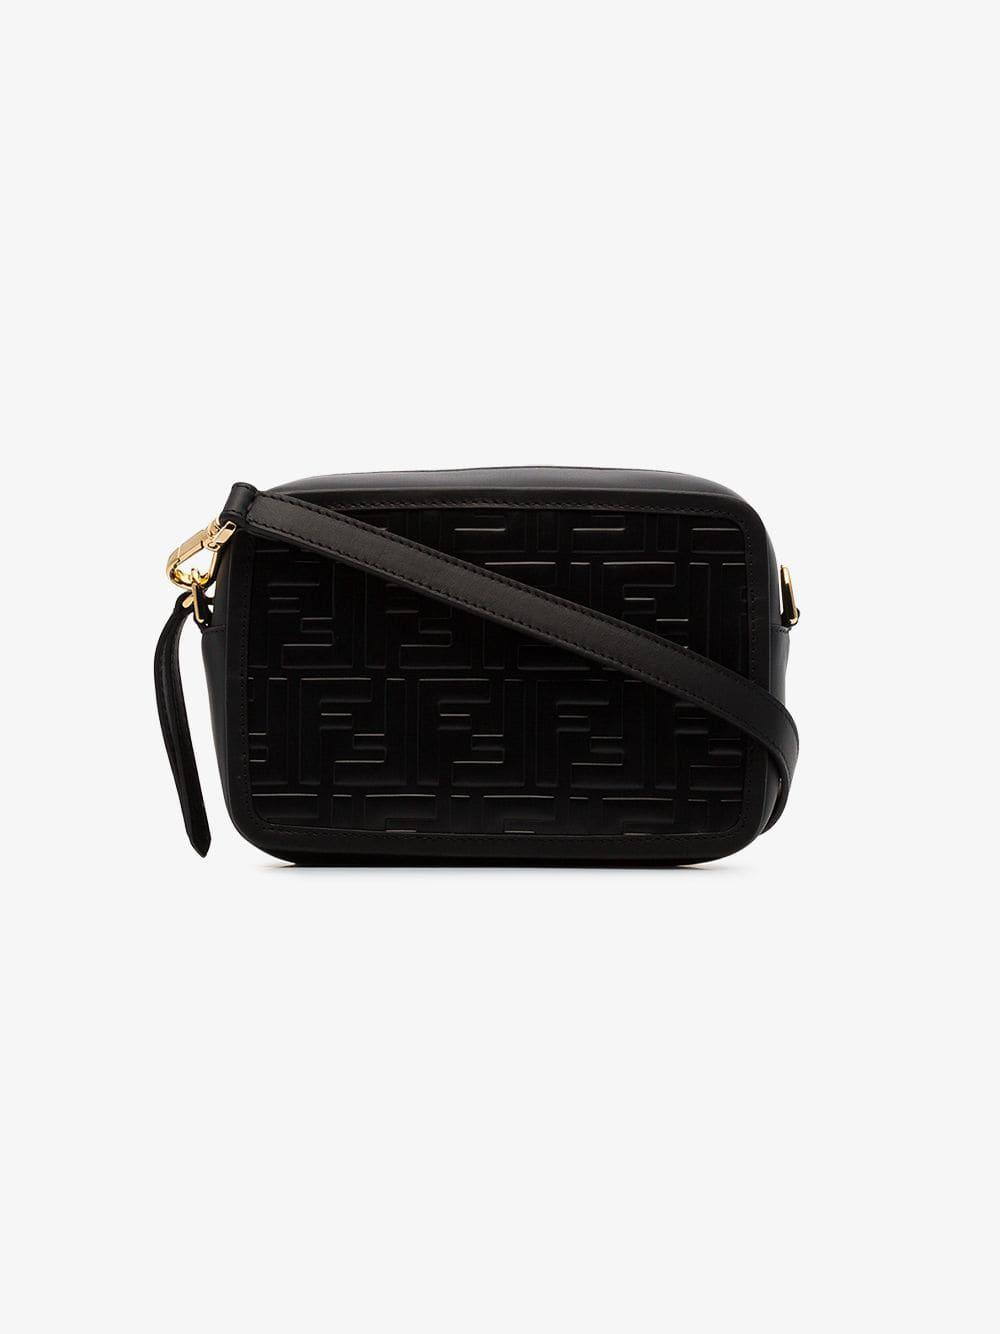 5870947527c1 Lyst - Fendi Black Logo Embossed Mini Leather Camera Bag in Black